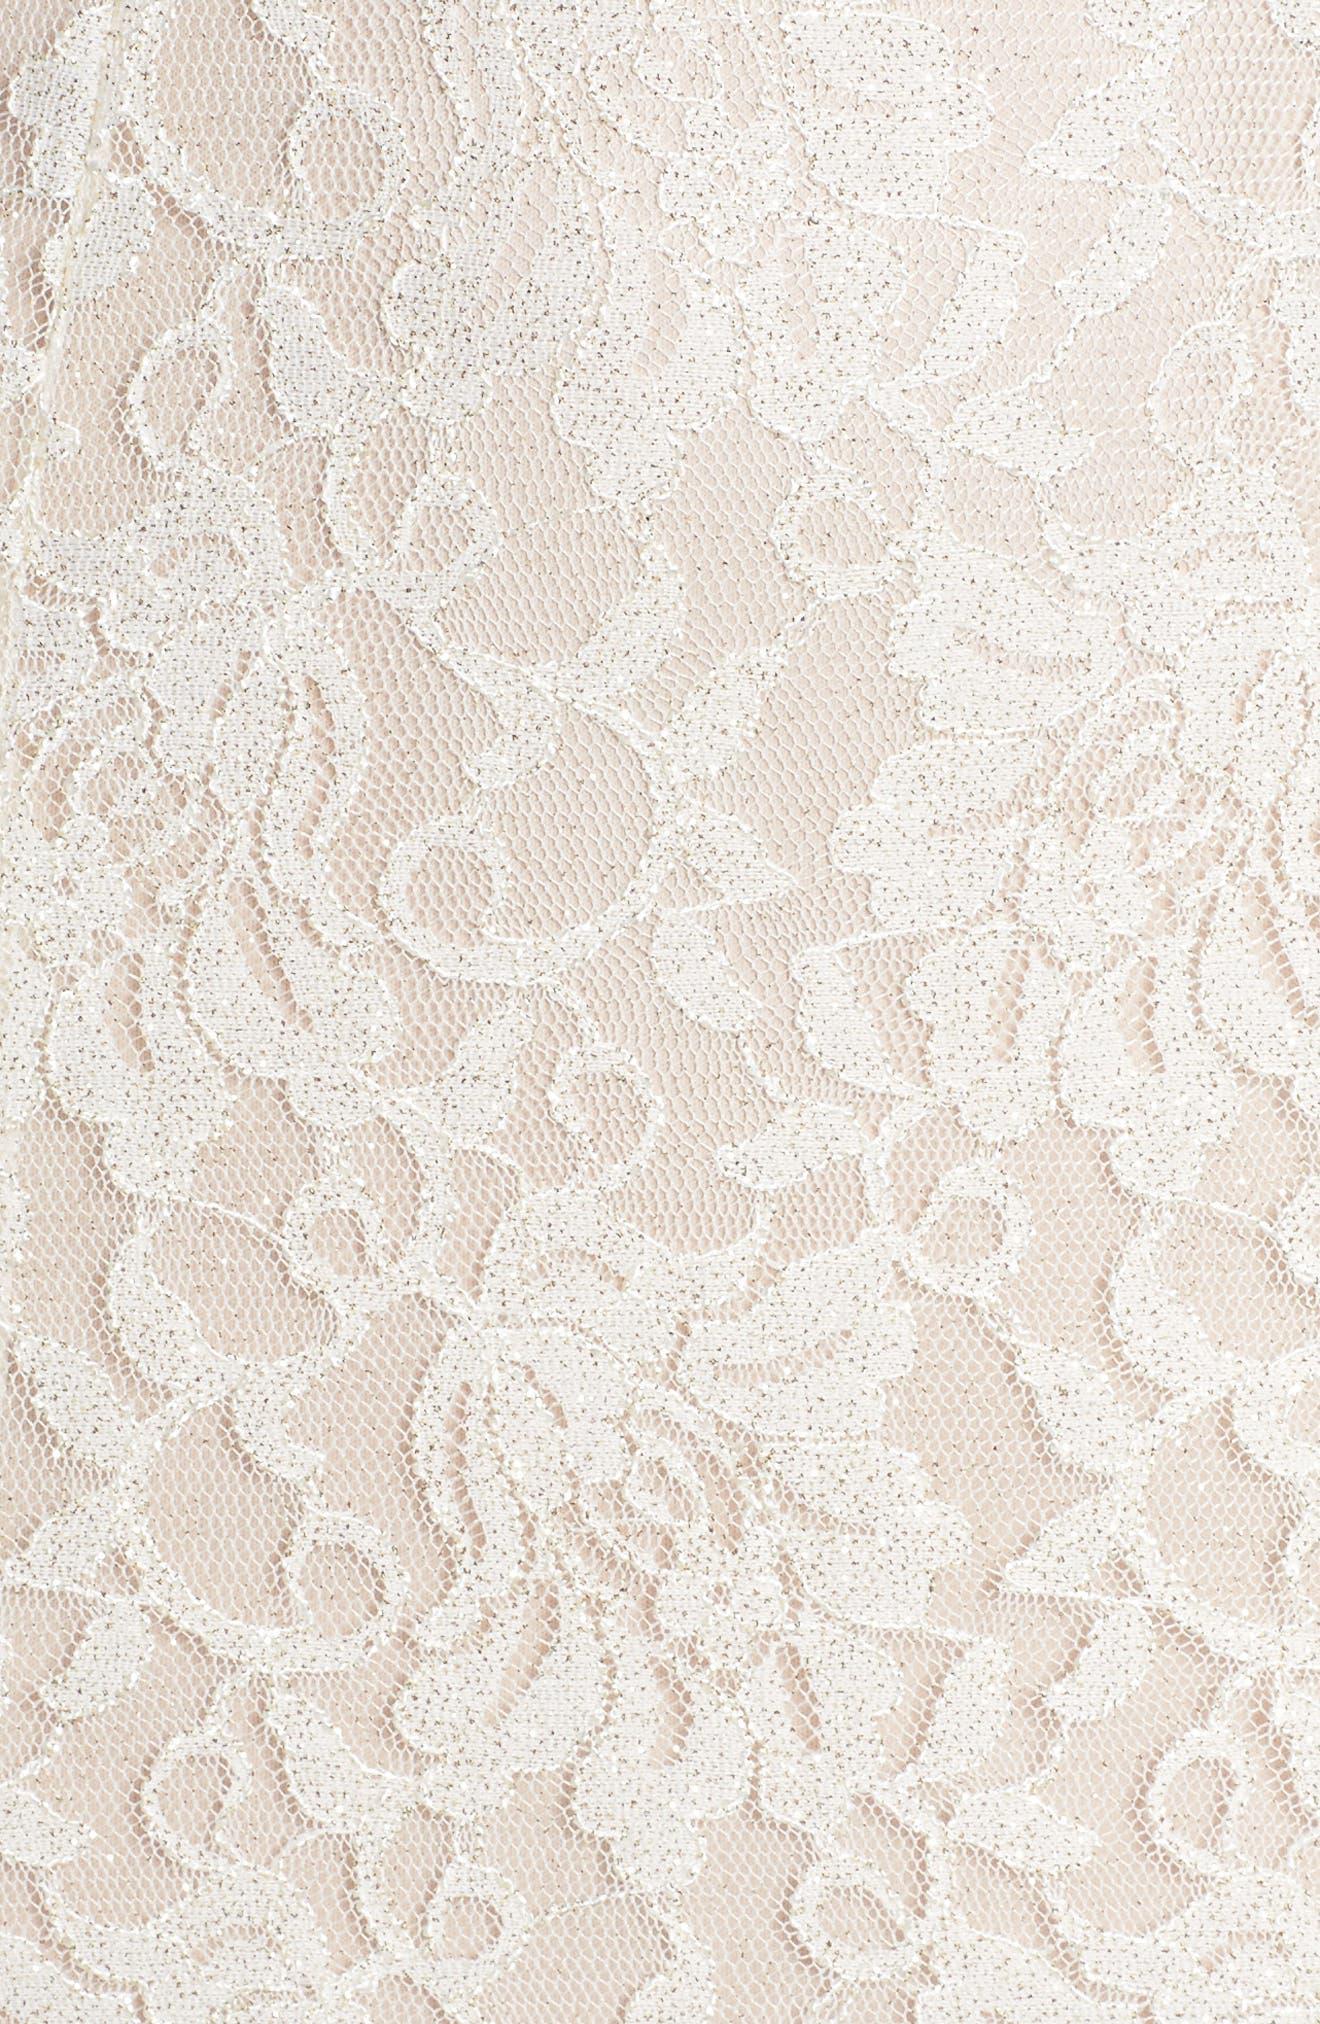 Scallop Detail Lace Gown,                             Alternate thumbnail 5, color,                             902